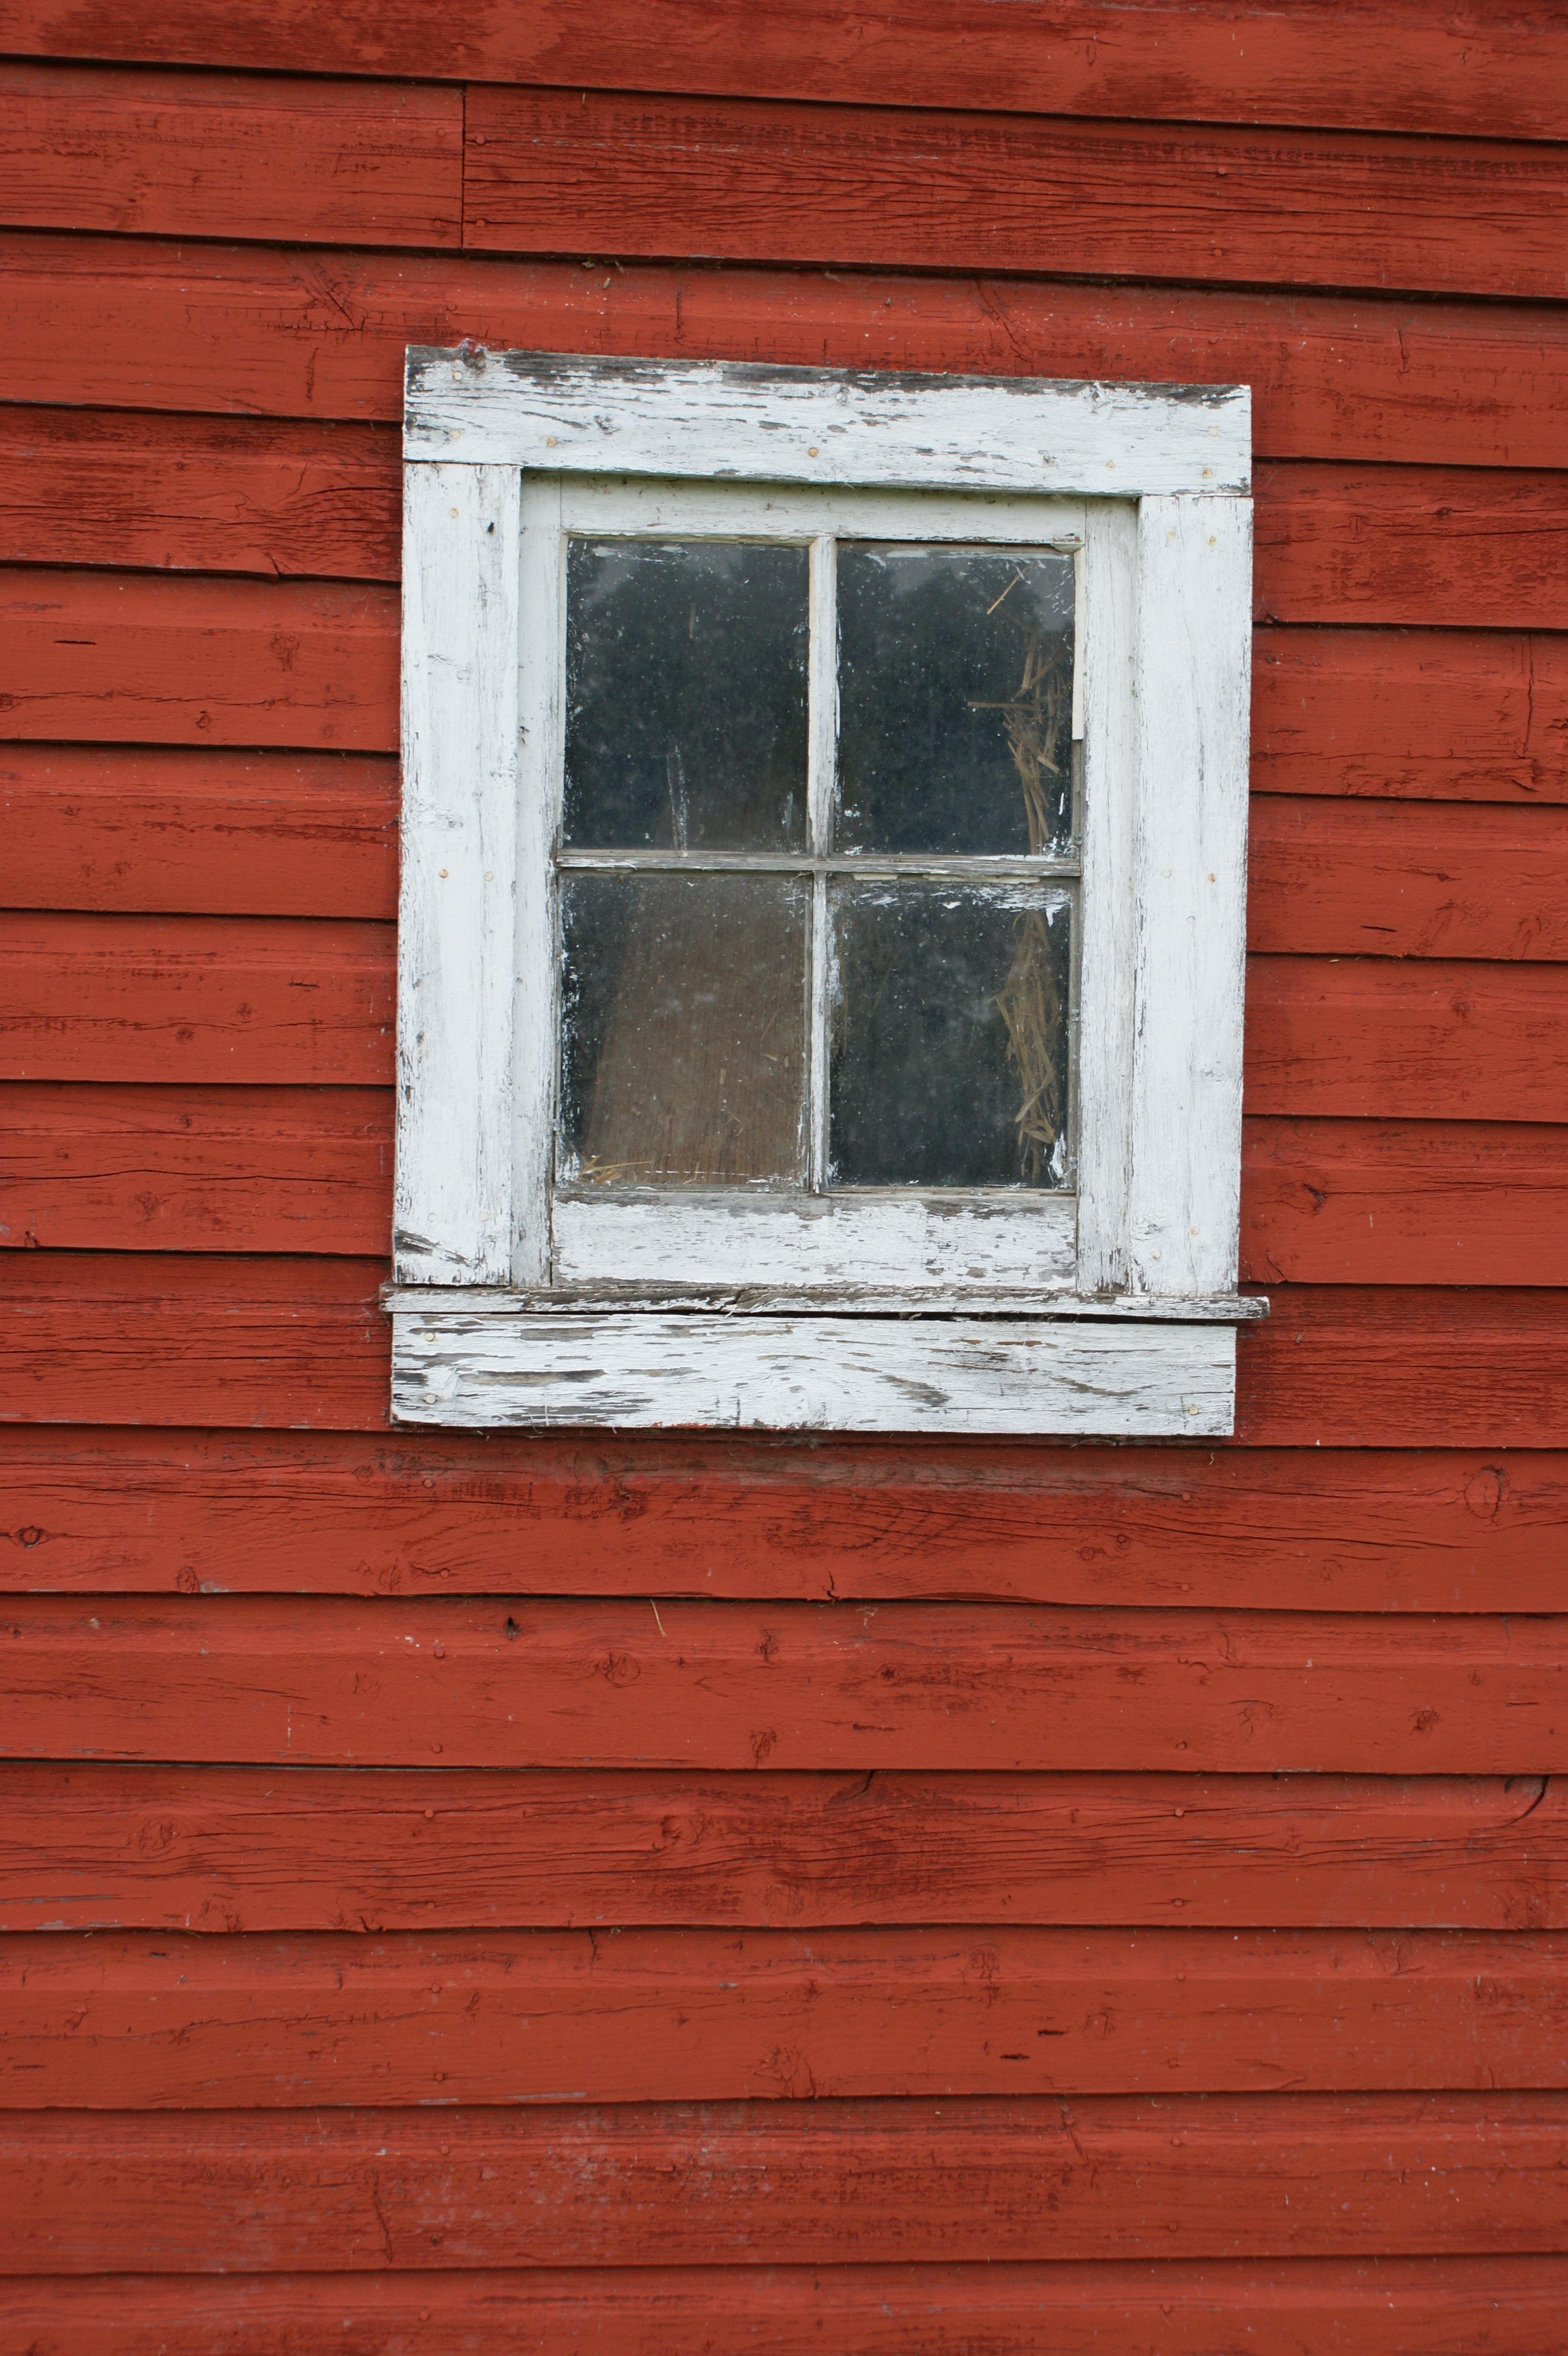 of er house white tutorial a install to interior quick how show doors barn com bless sliding blesserhouse